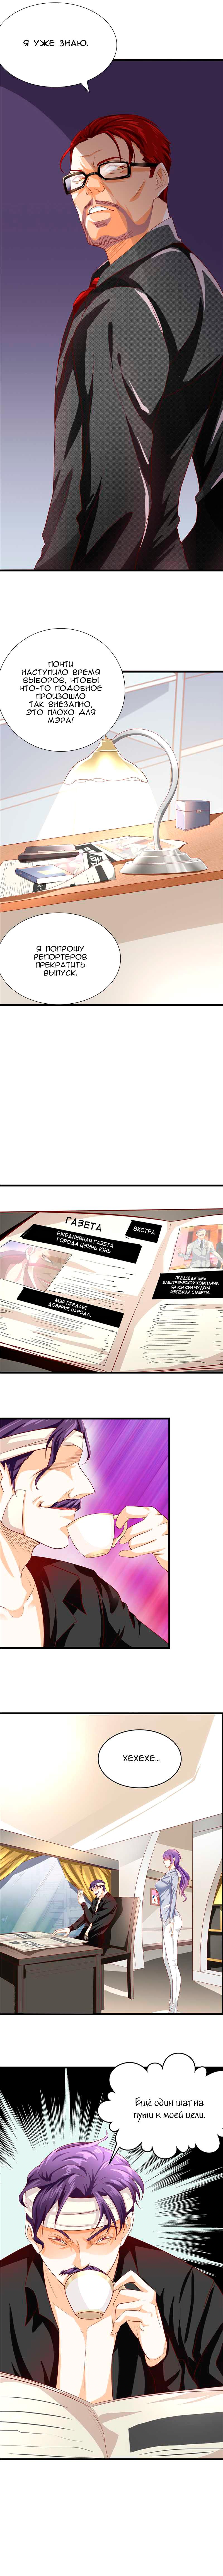 Манга Первоклассный мастер / First Rate Master  - Том 1 Глава 26 Страница 6